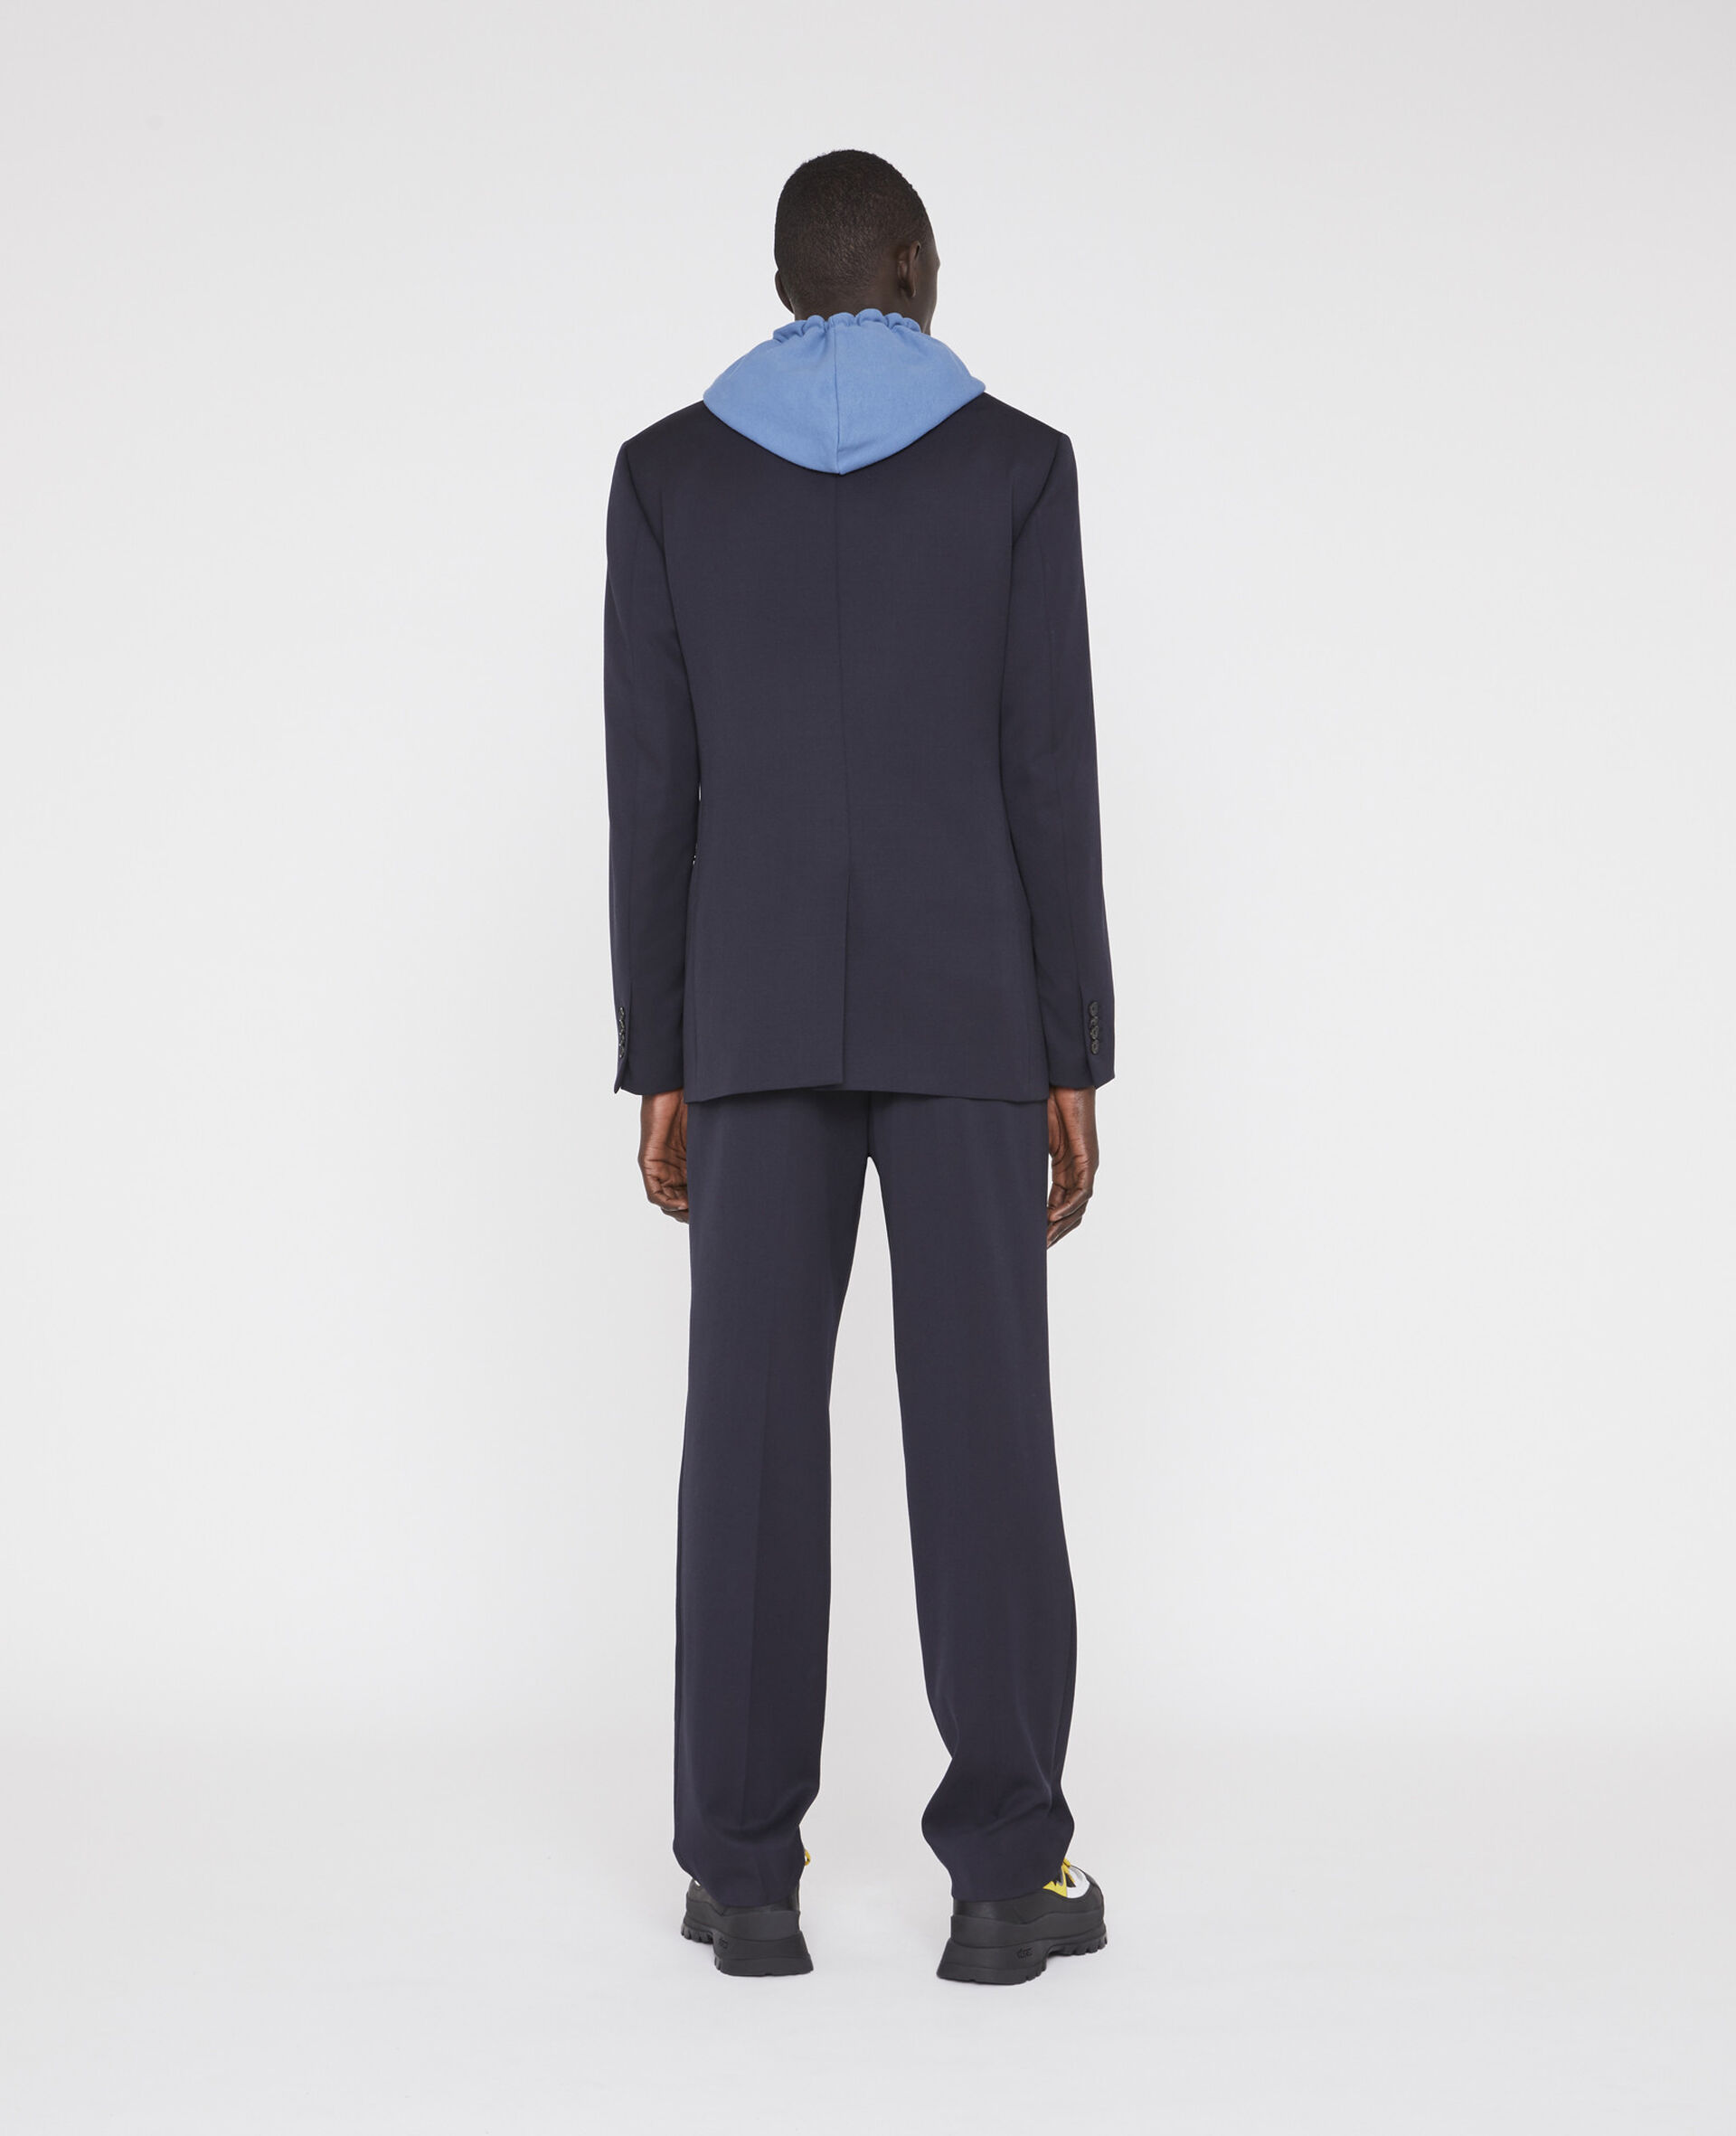 Couture-Jackett Holden-Blau-large image number 2